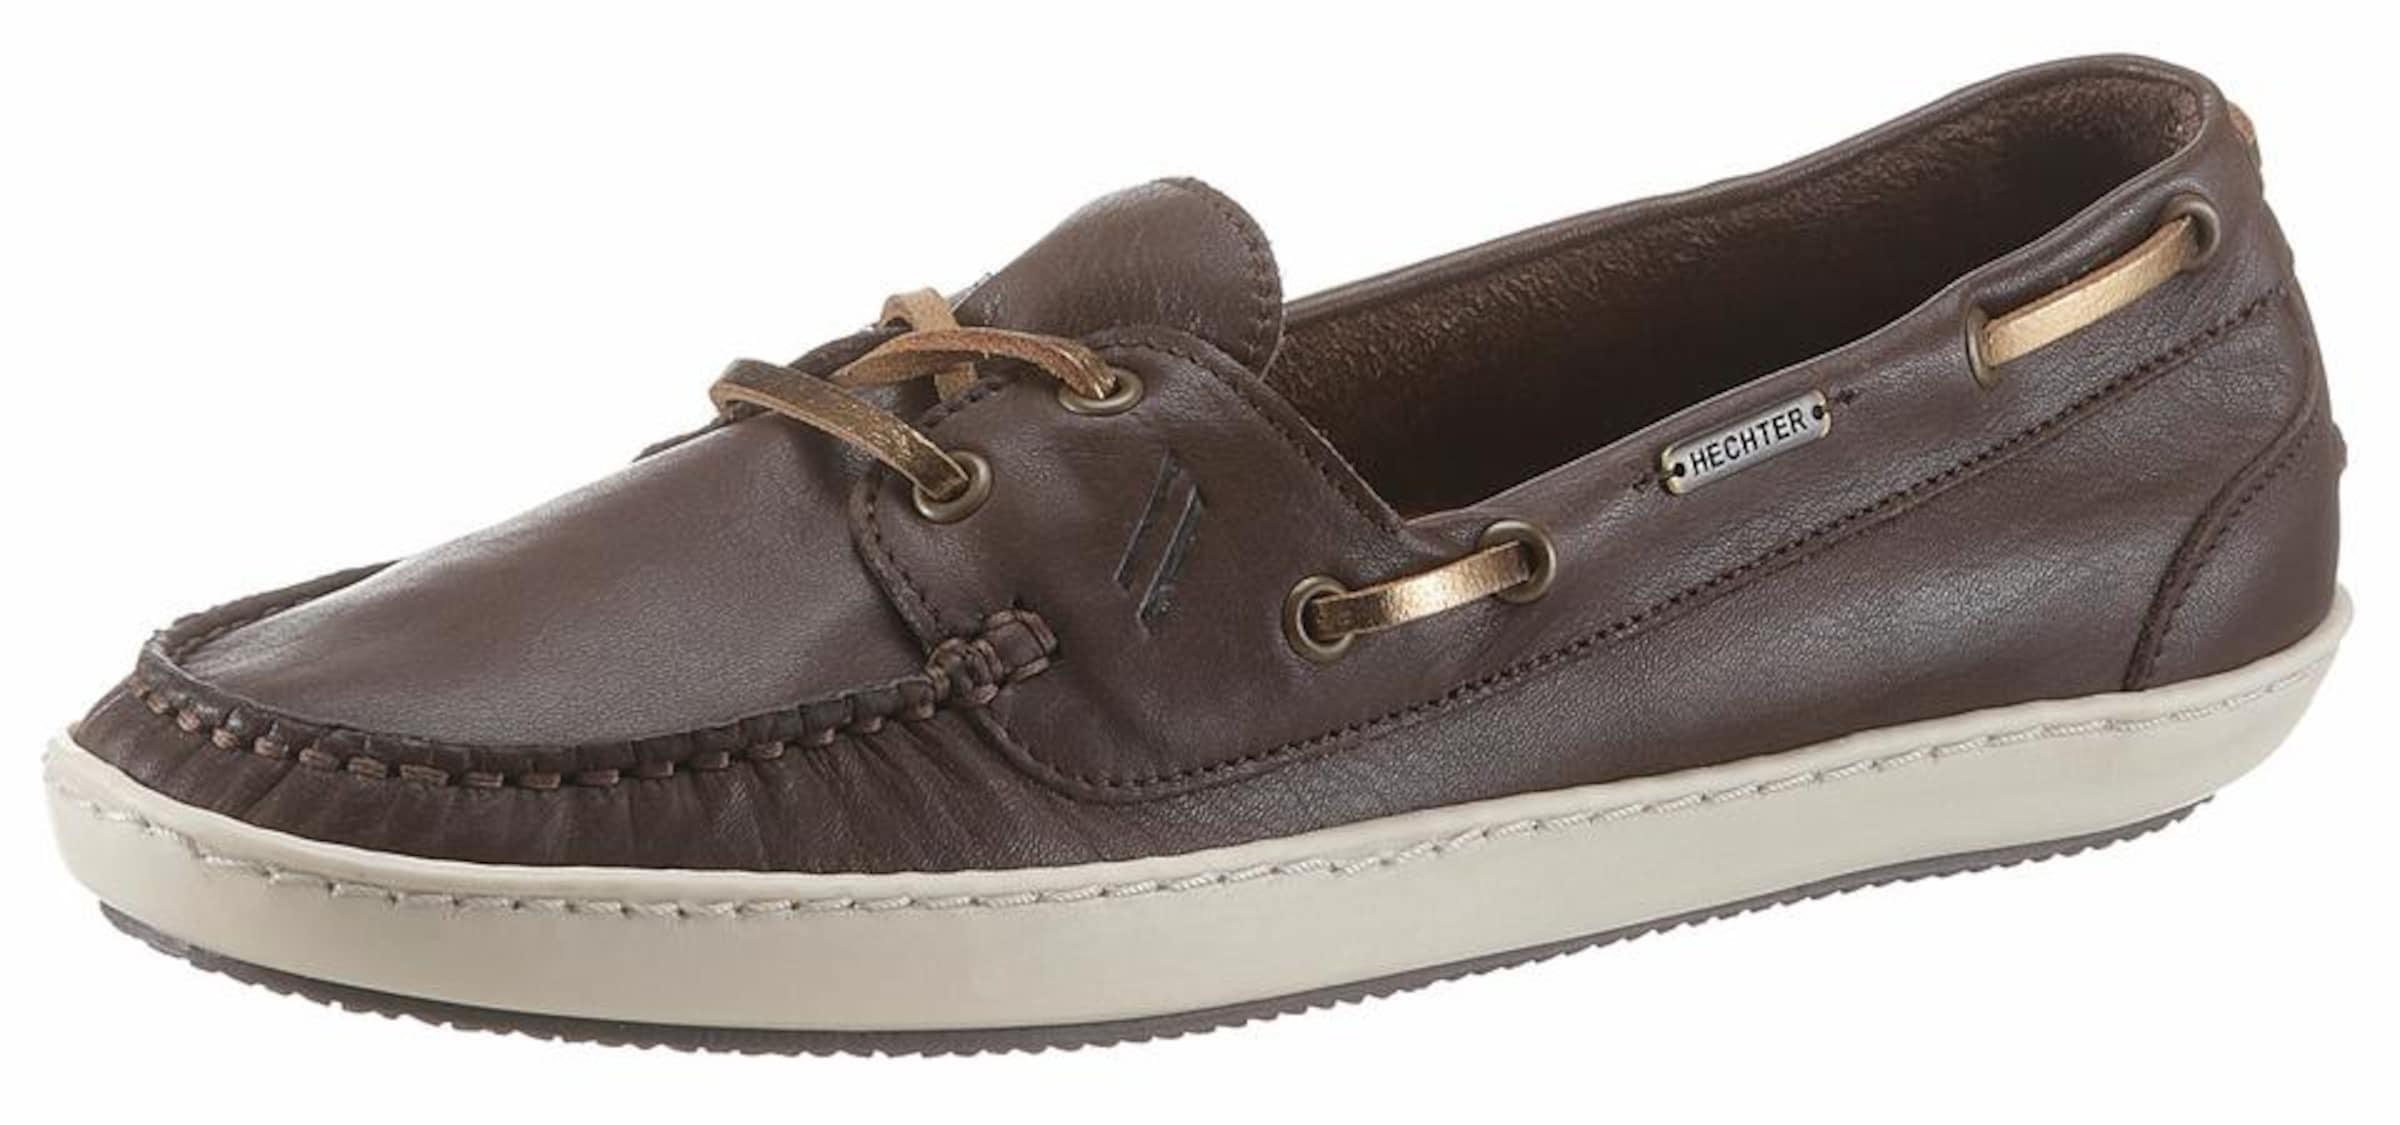 DANIEL HECHTER Mokassin Beatrice Verschleißfeste billige Schuhe